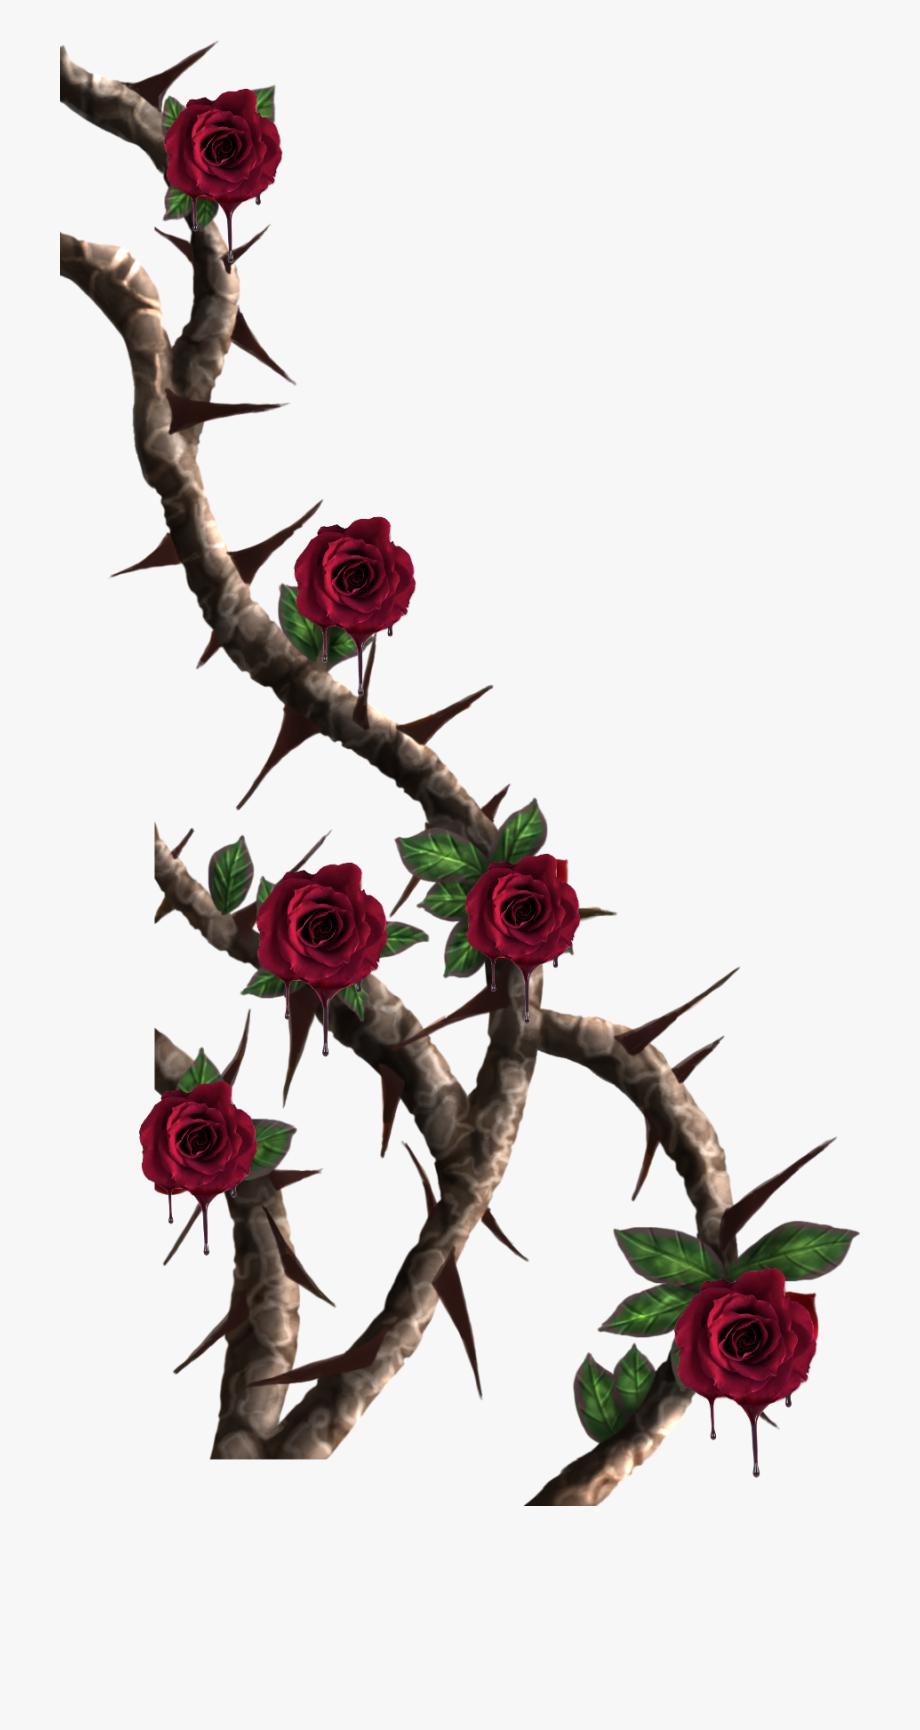 vines #roses #rose #vine #red #thorns #melting #drip.